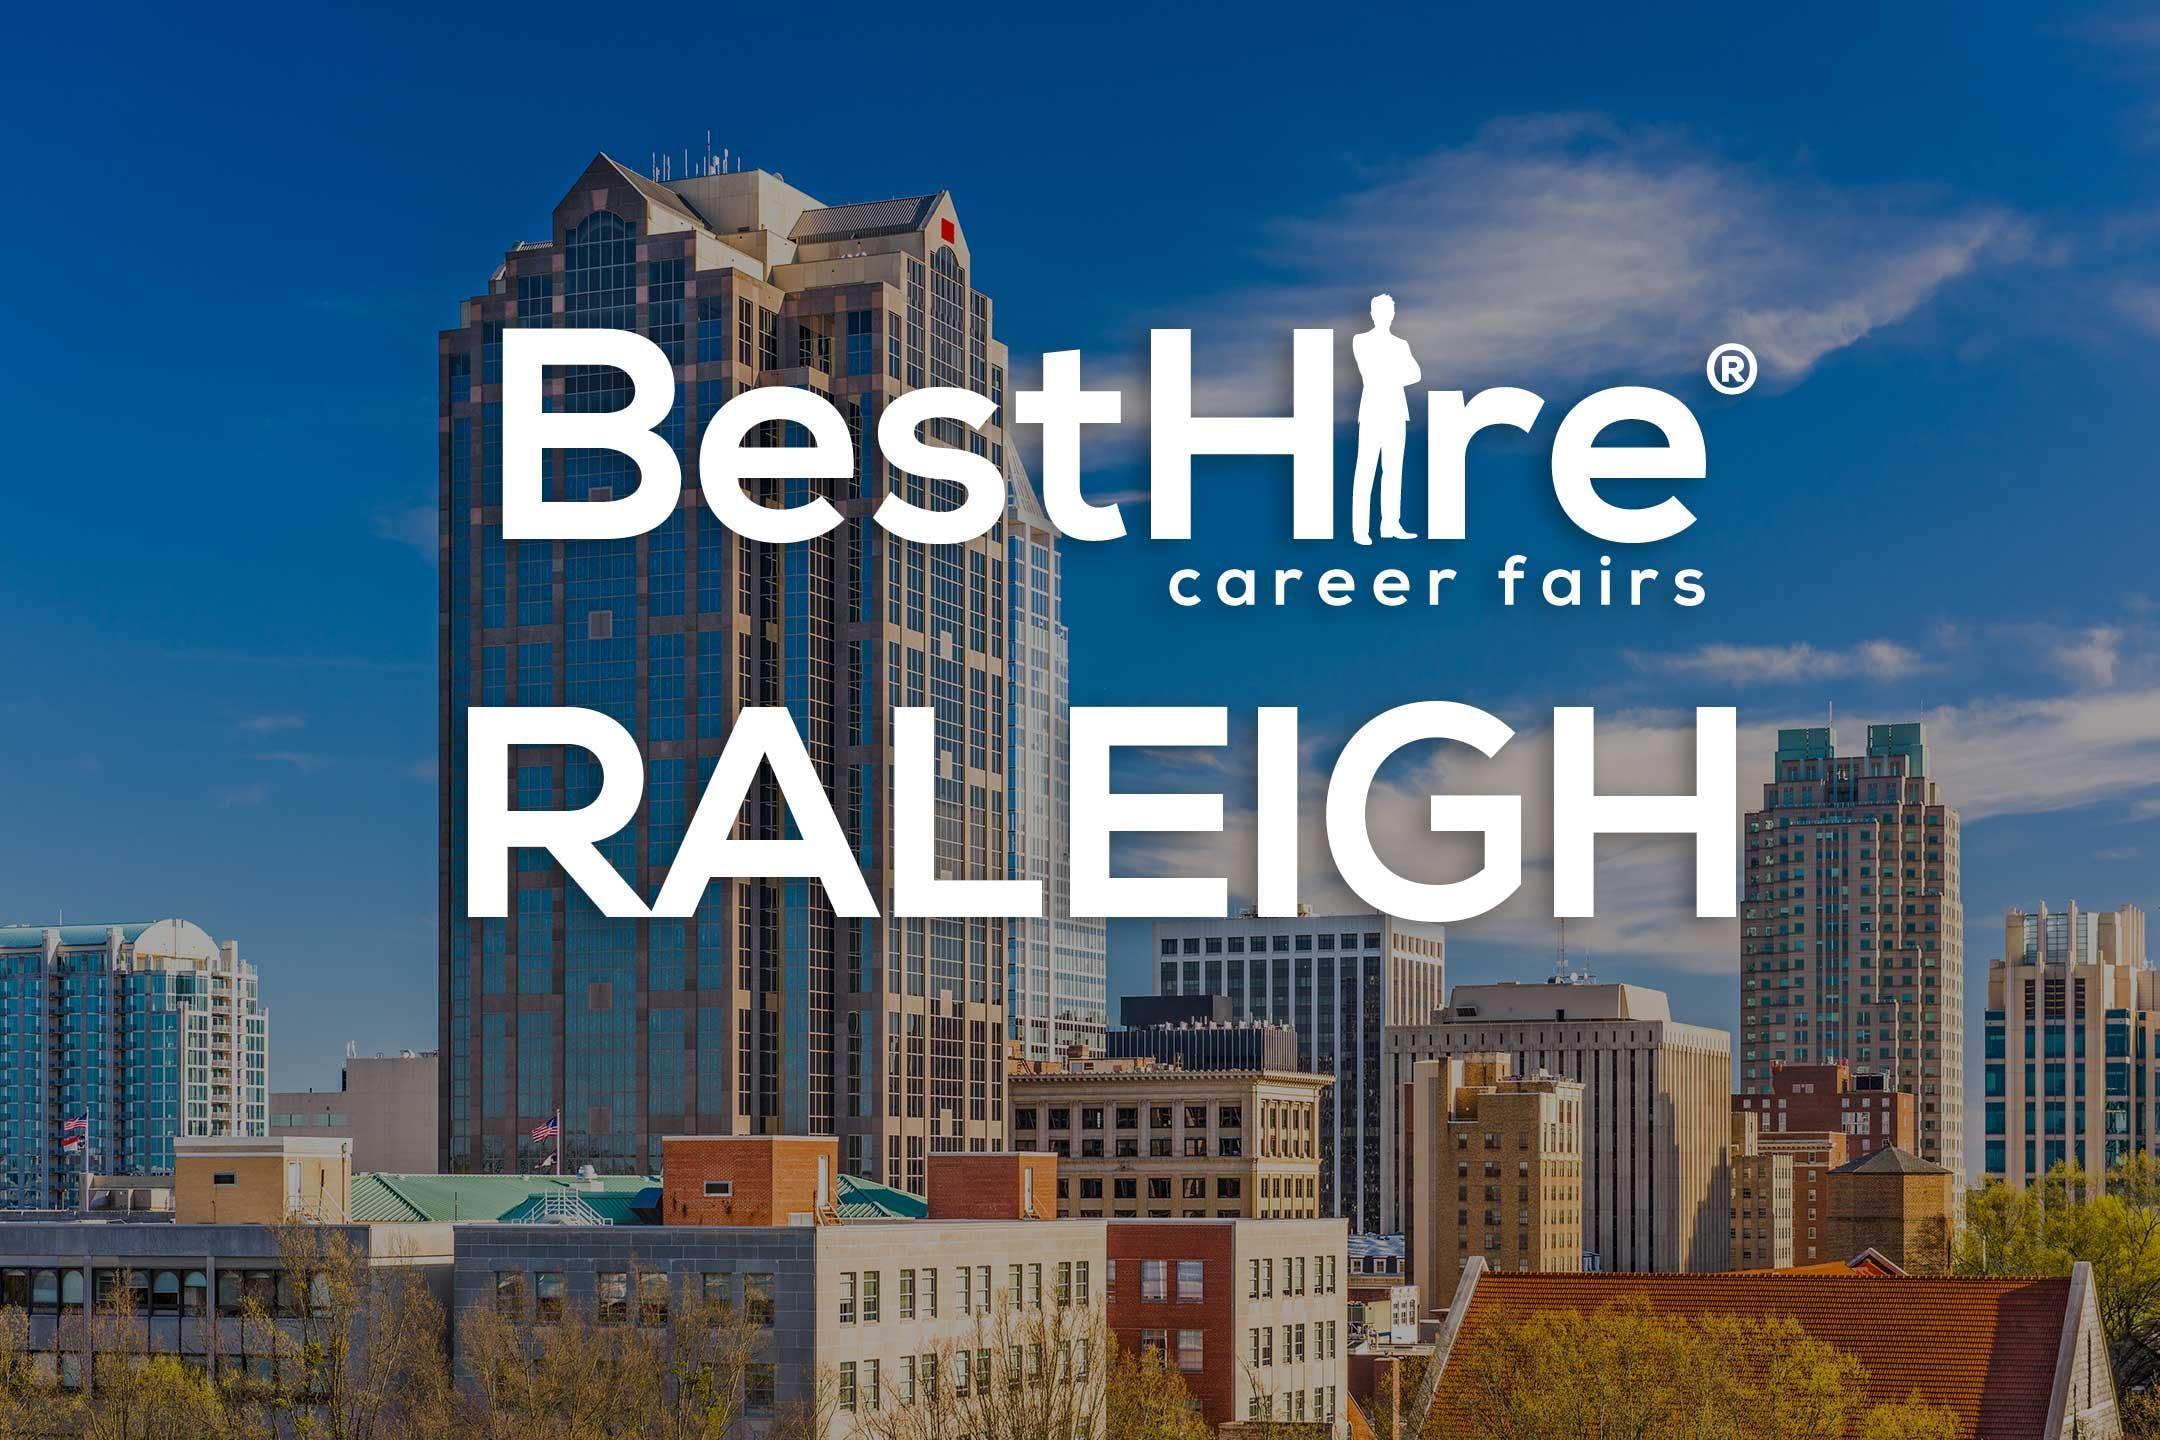 Raleigh Job Fair February 13th - DoubleTree by Hilton Raleigh Brownstone